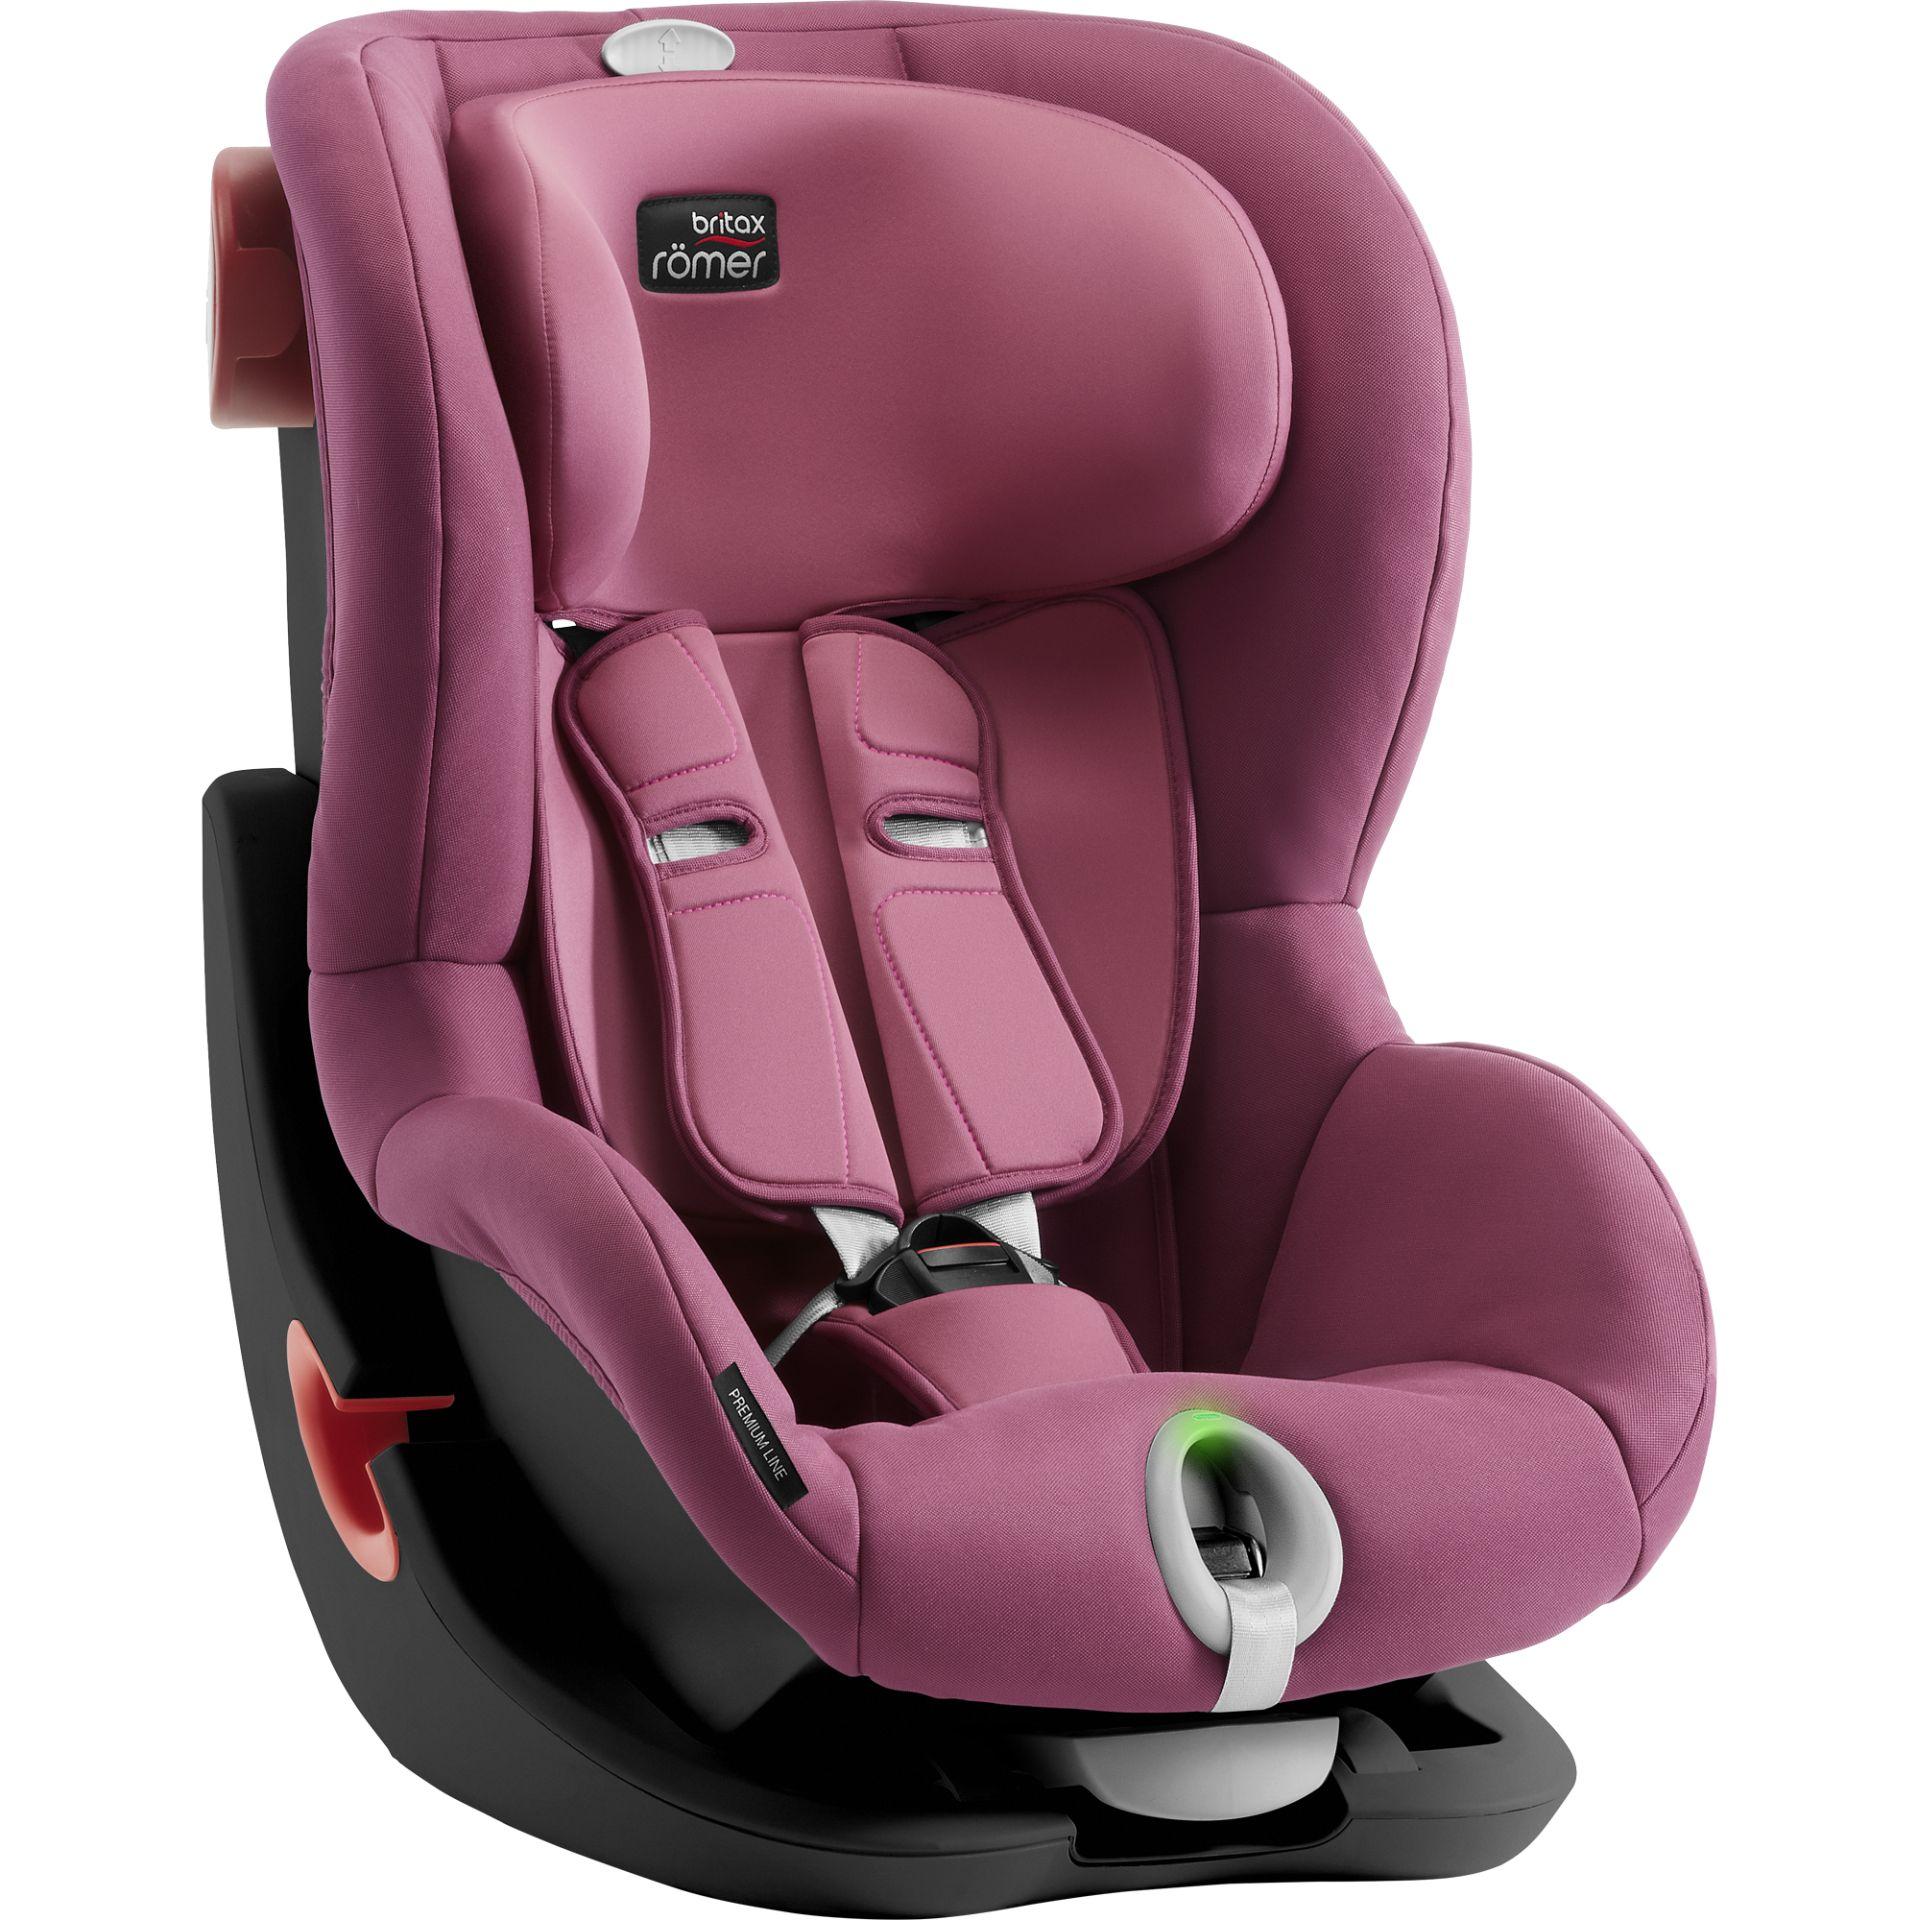 britax r mer child car seat king ii ls black series 2019 wine rose buy at kidsroom car seats. Black Bedroom Furniture Sets. Home Design Ideas